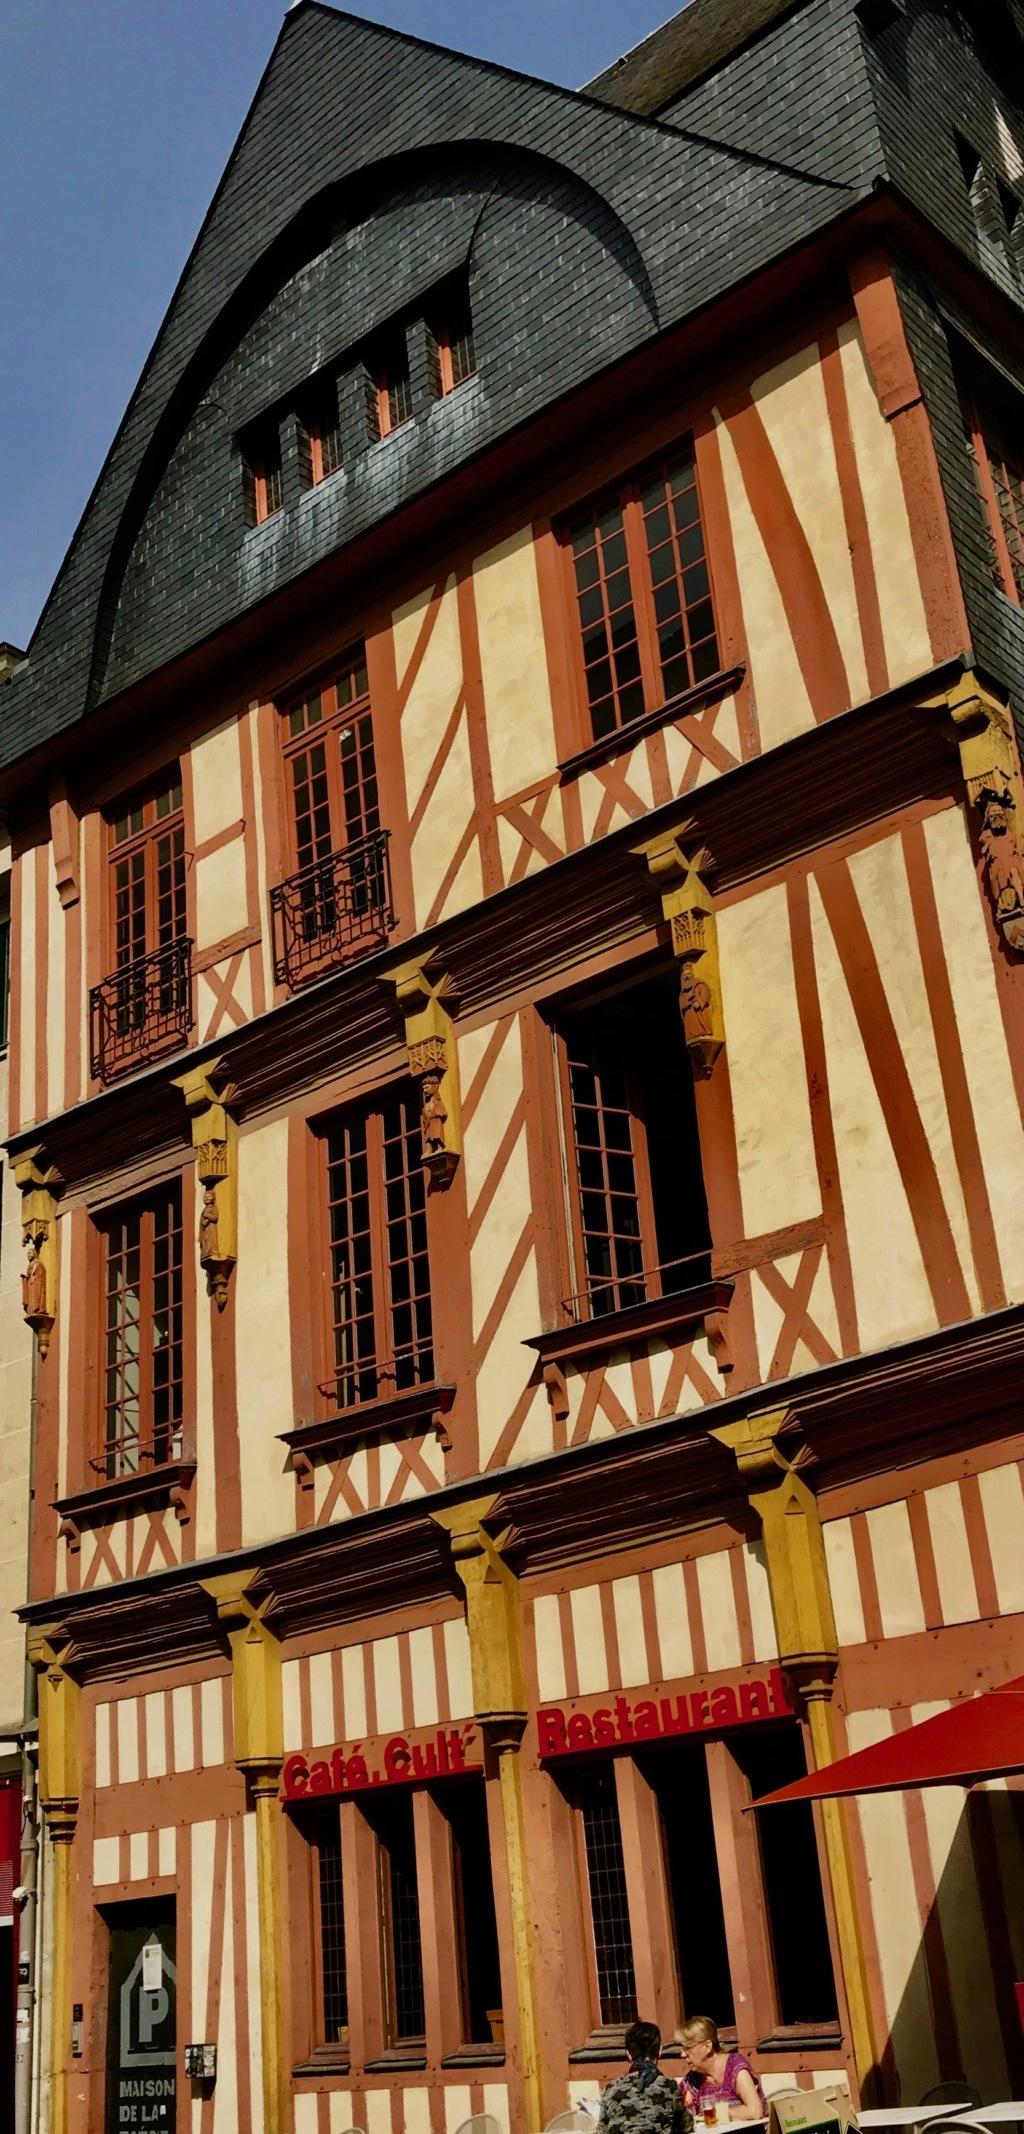 BALADE - De Nantes à Montaigu, la digue, la digue... 2913